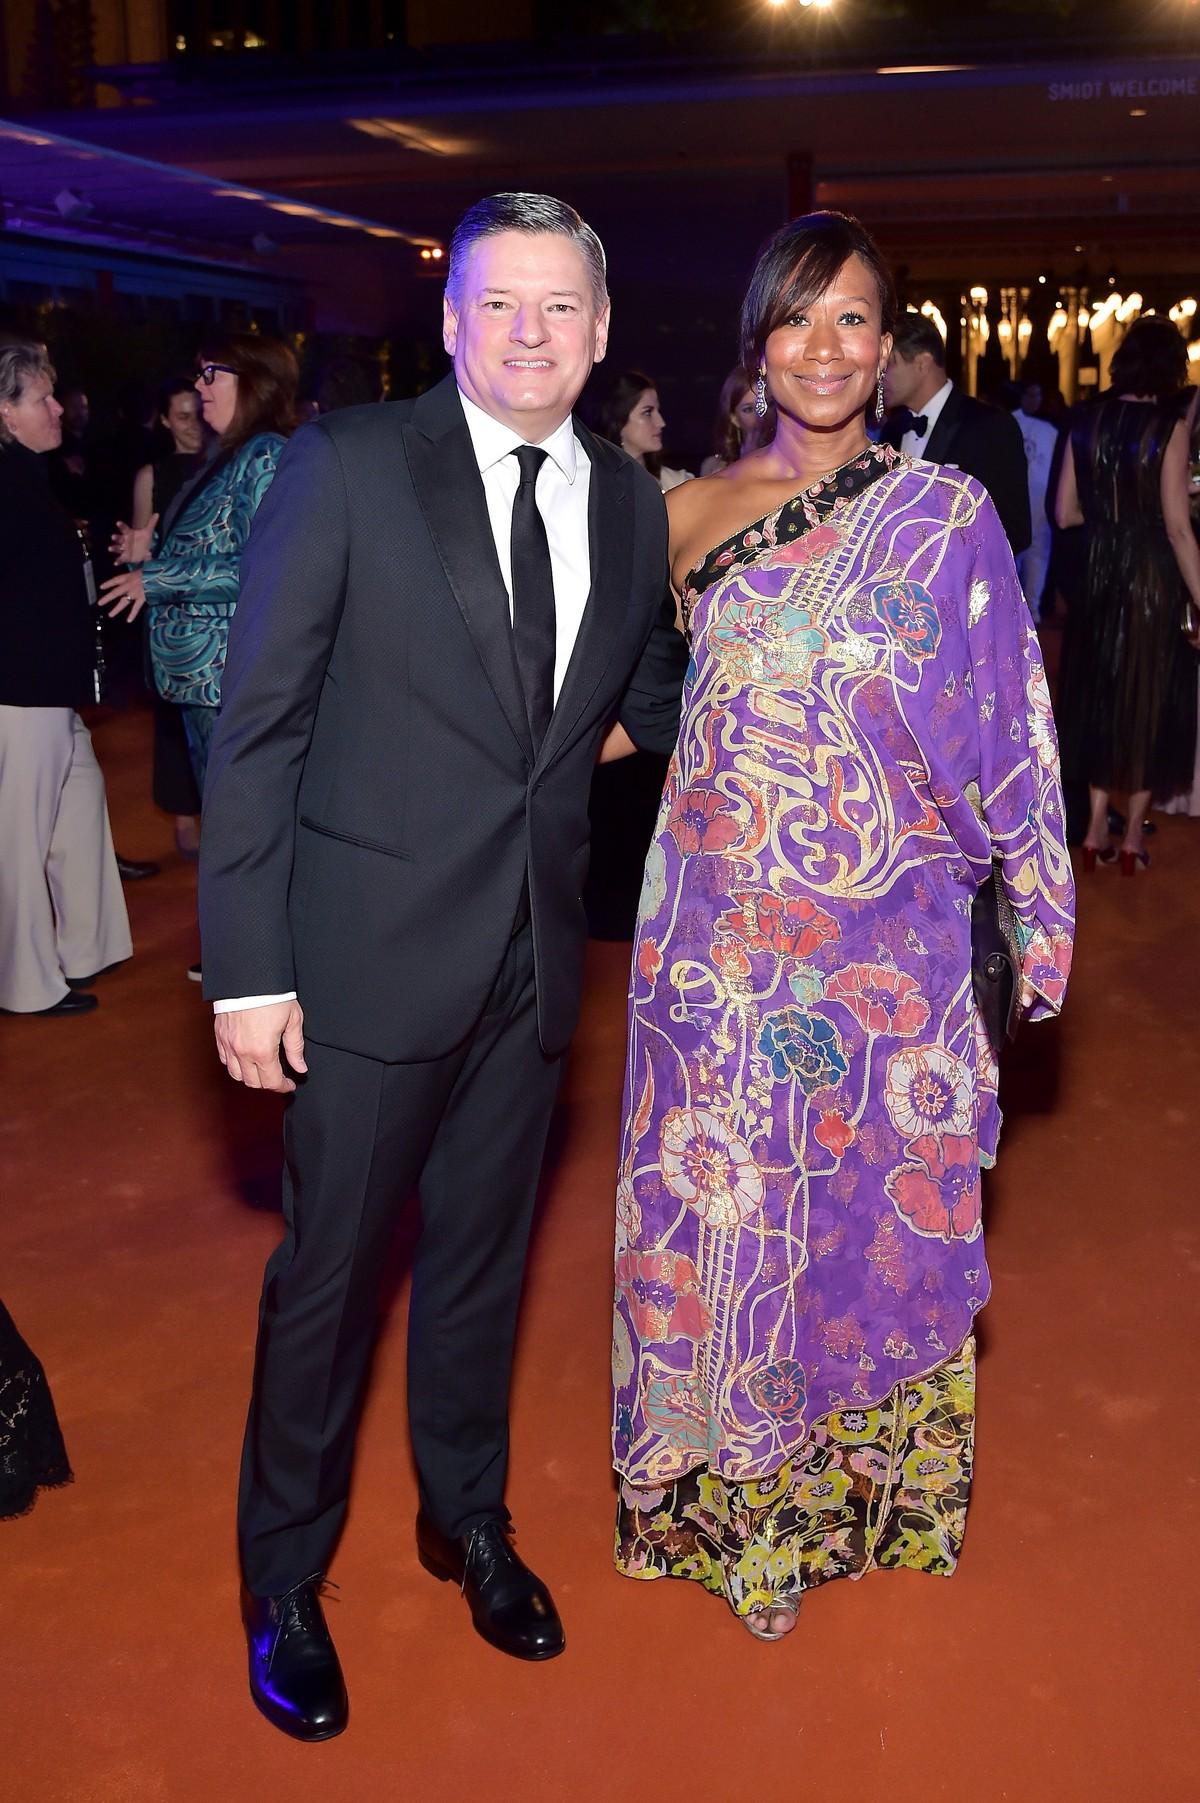 Lacma Art and Film Gala 2018 red carpet